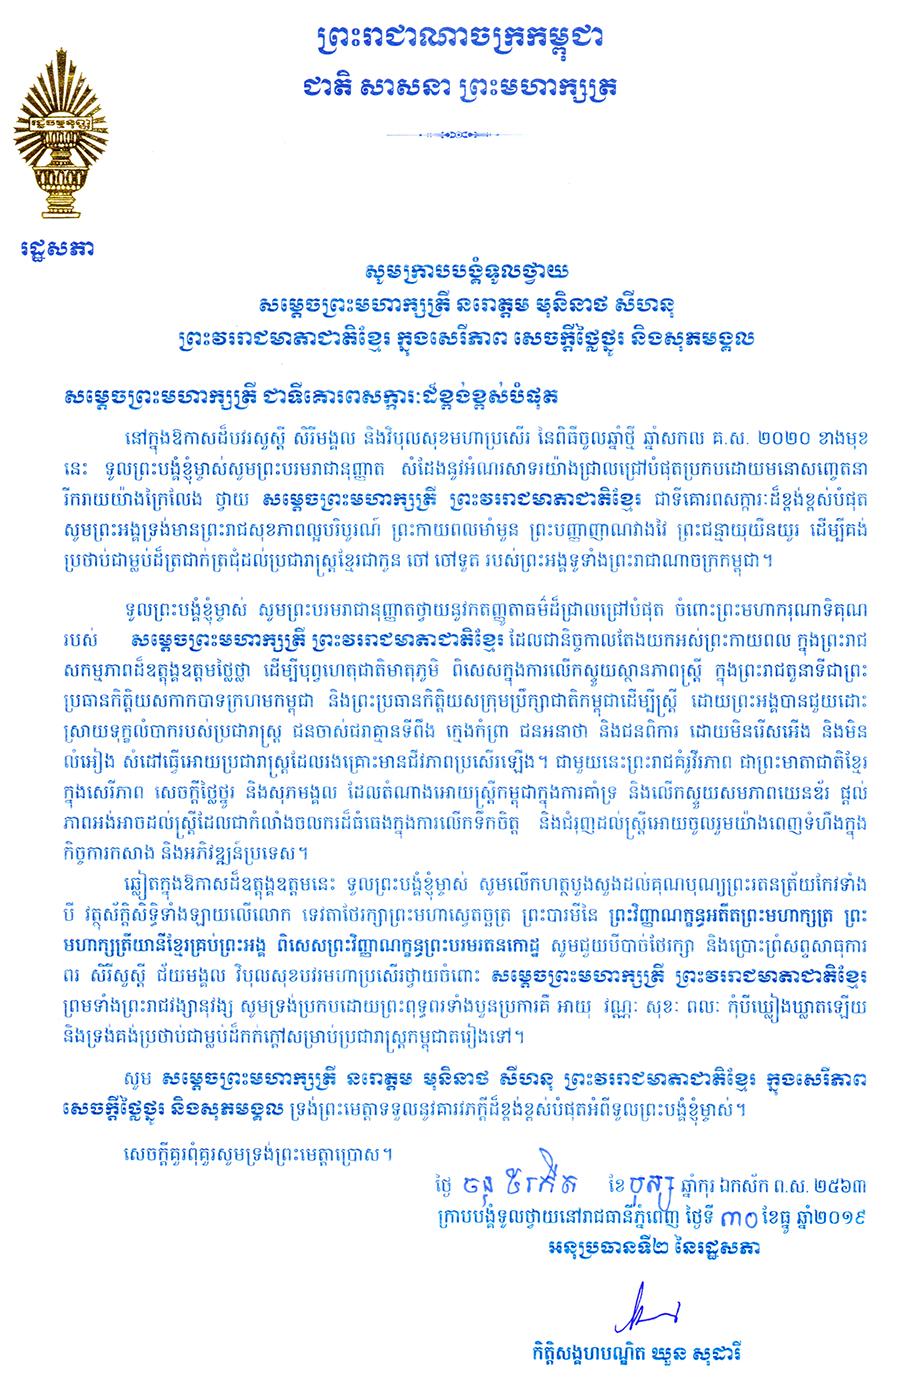 All/correspondance/CorrespondancedEtat/2019/Dcembre/id2561/001.jpg